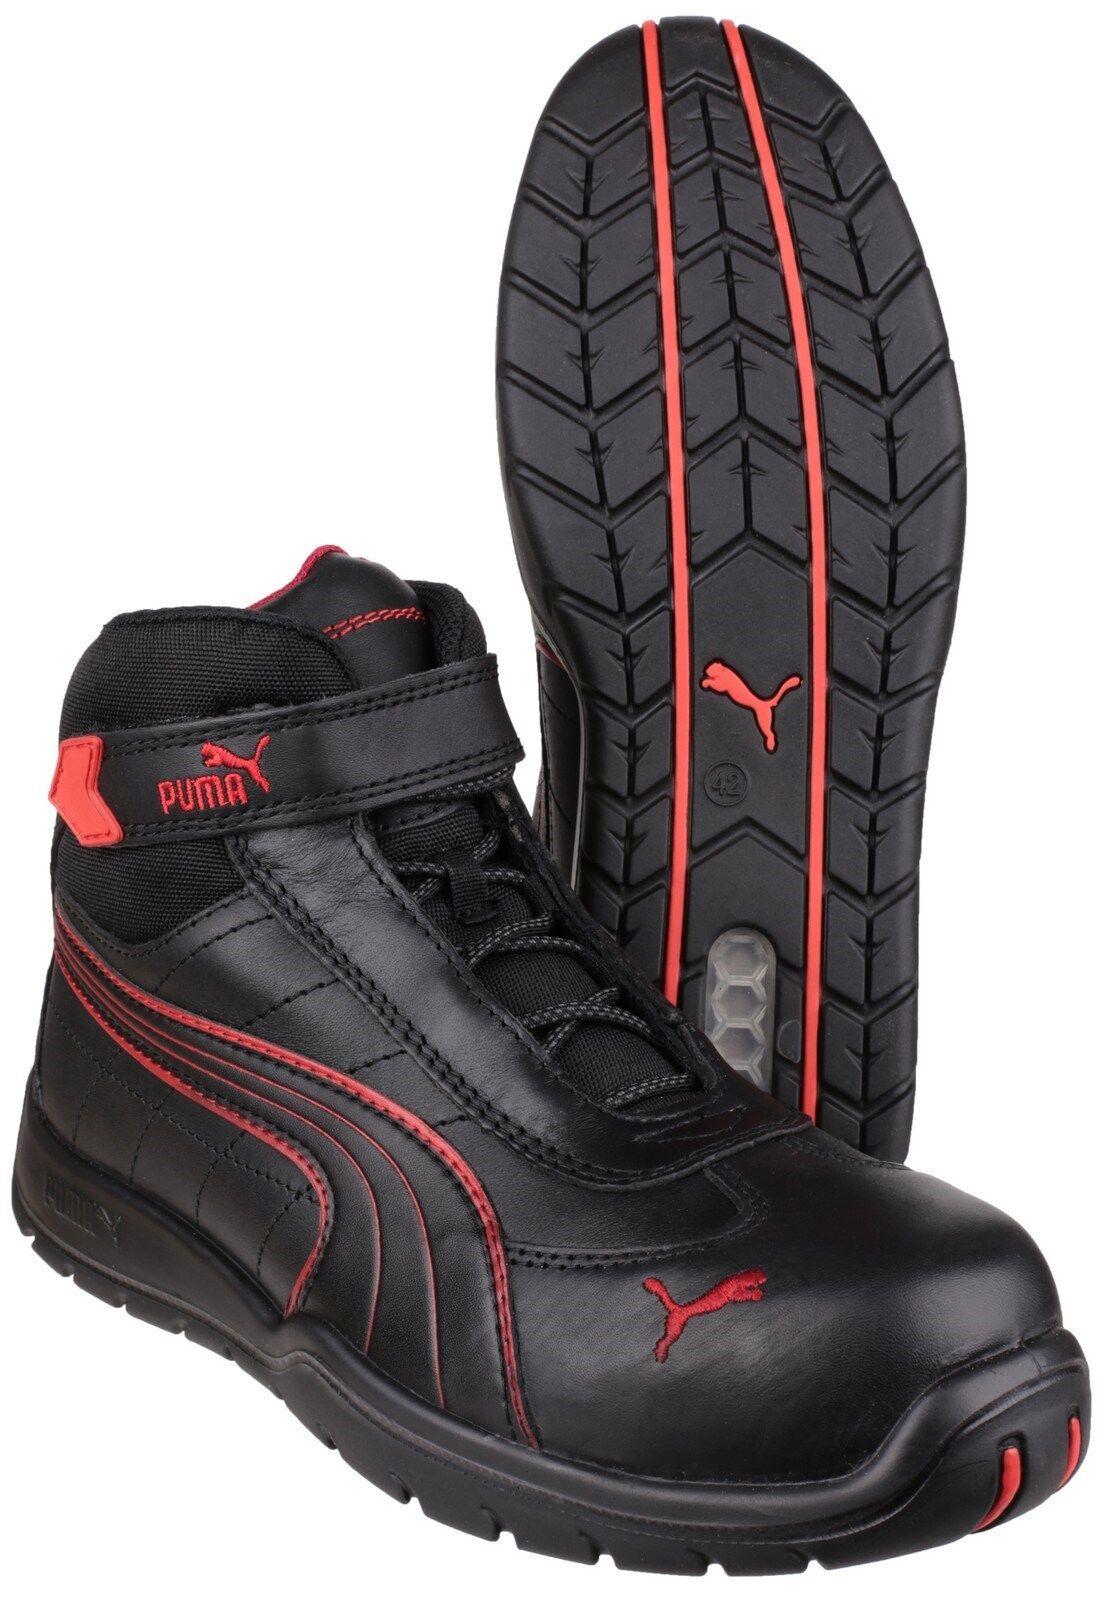 Puma Daytona Mid Mid Mid Safety Mens Composite Toe Cap Industrial Work Boots UK6-12 249745